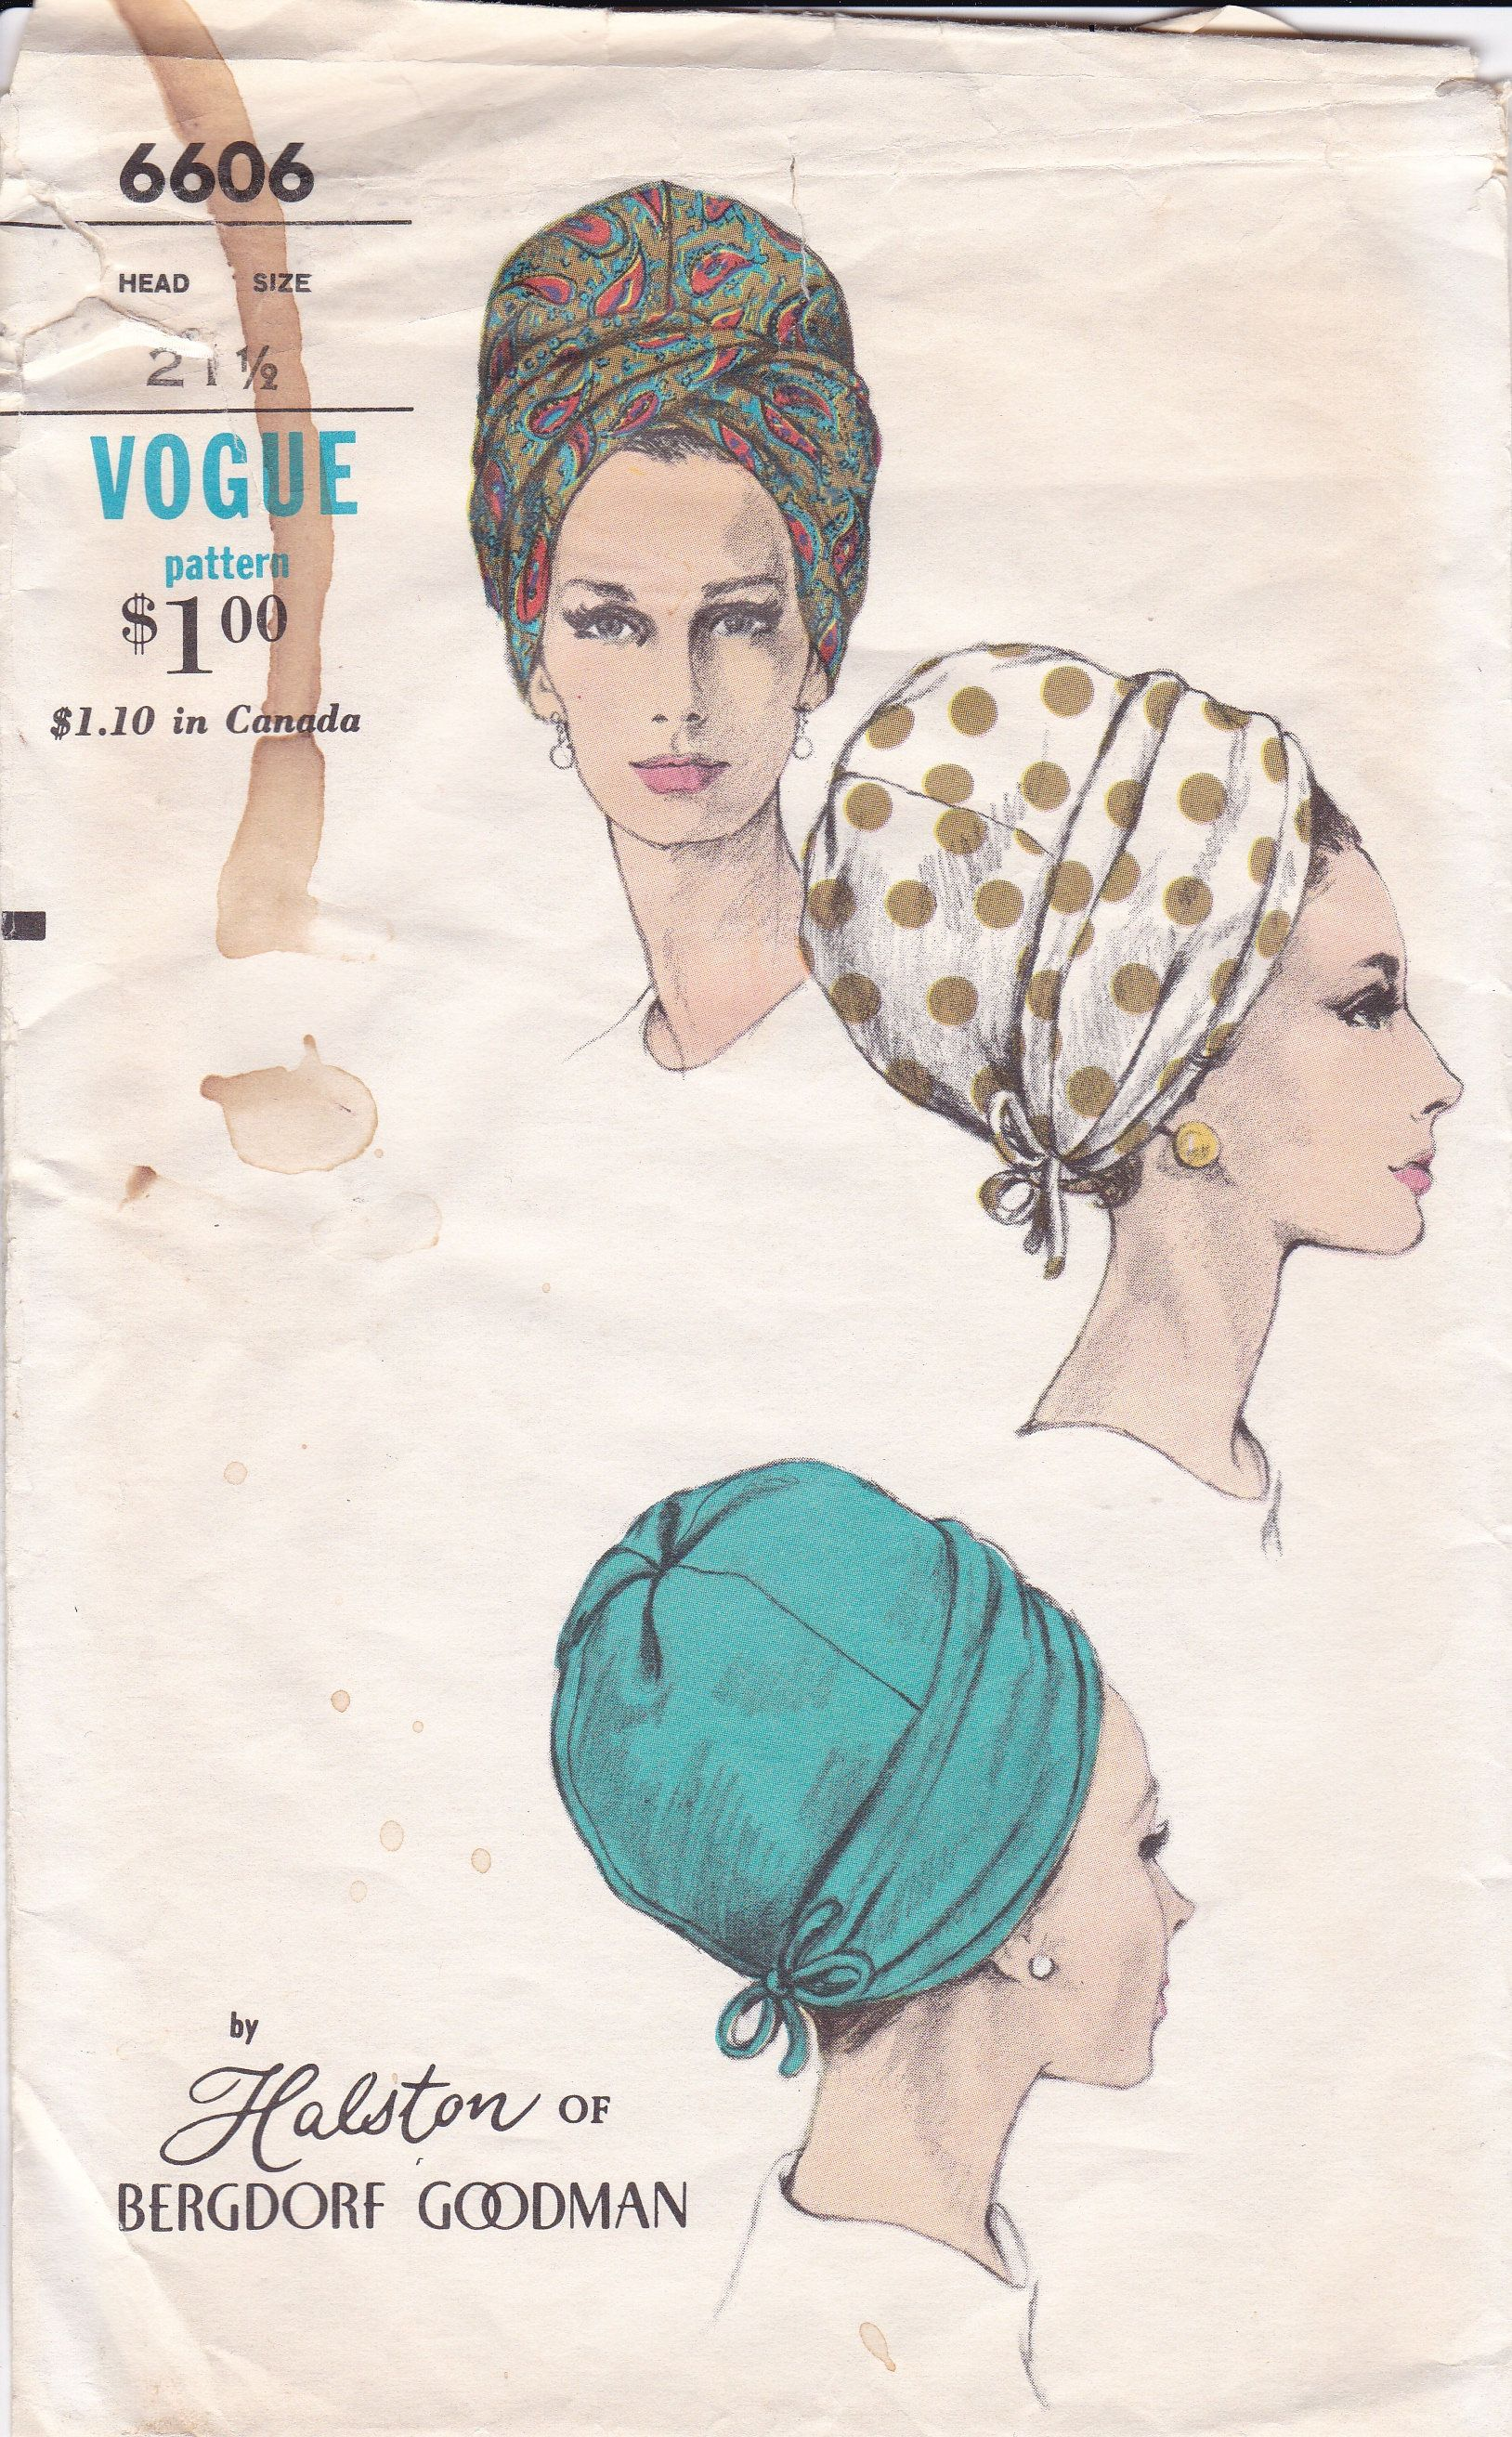 bb5af231025 FREE US SHIP Sewing Pattern Vogue Vintage Vintage Retro 1960s 60s 7153 Mod  Turban Hat Designer Halston of Bergdorf Goodman 21.5 Neatly Cut by  LanetzLiving ...